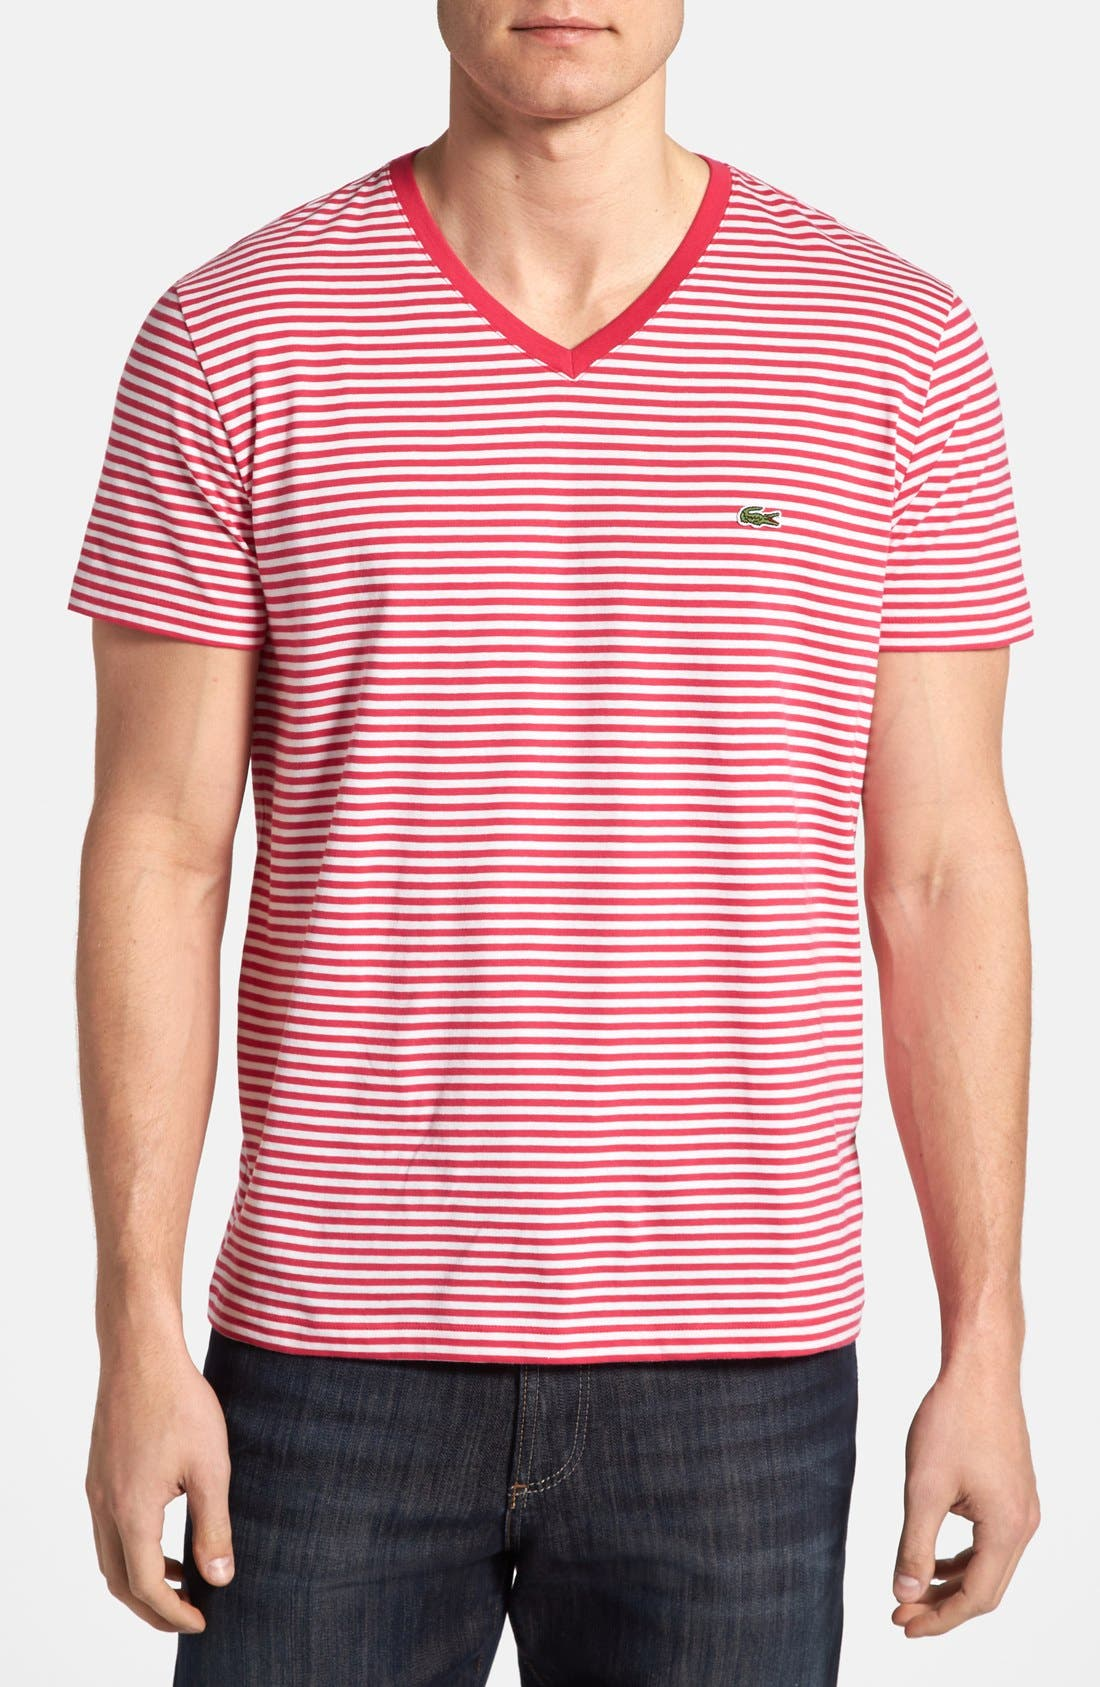 Alternate Image 1 Selected - Lacoste Heritage Fit Stripe Jersey V-Neck T-Shirt